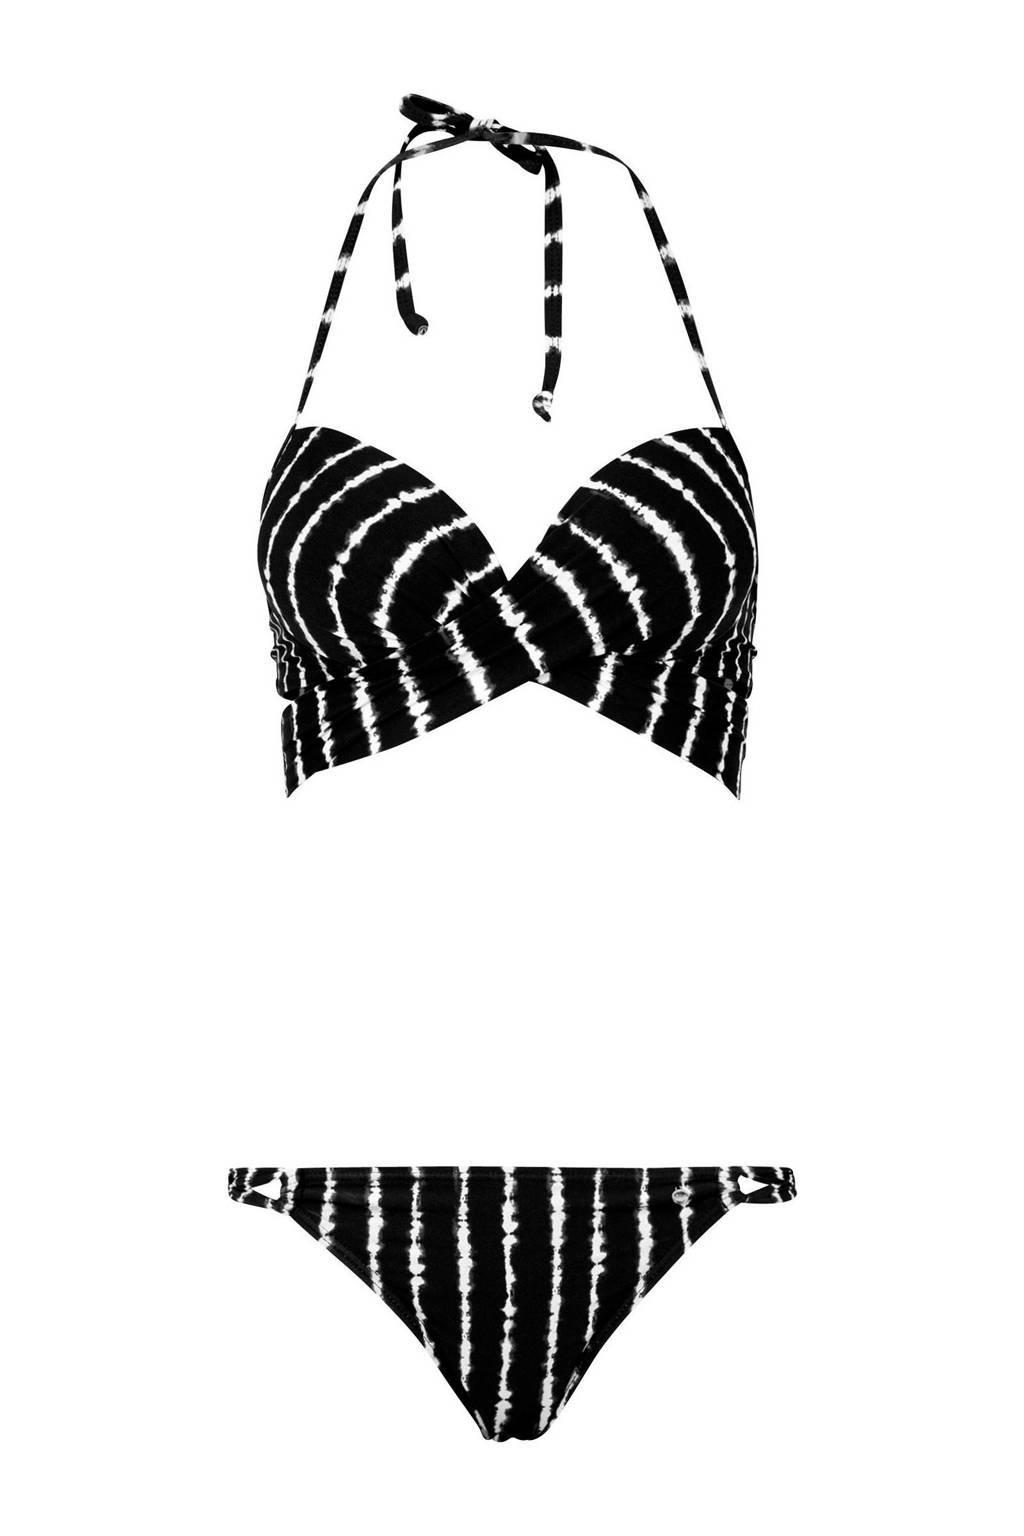 s.Oliver gestreepte push up bikini zwart, Zwart/wit